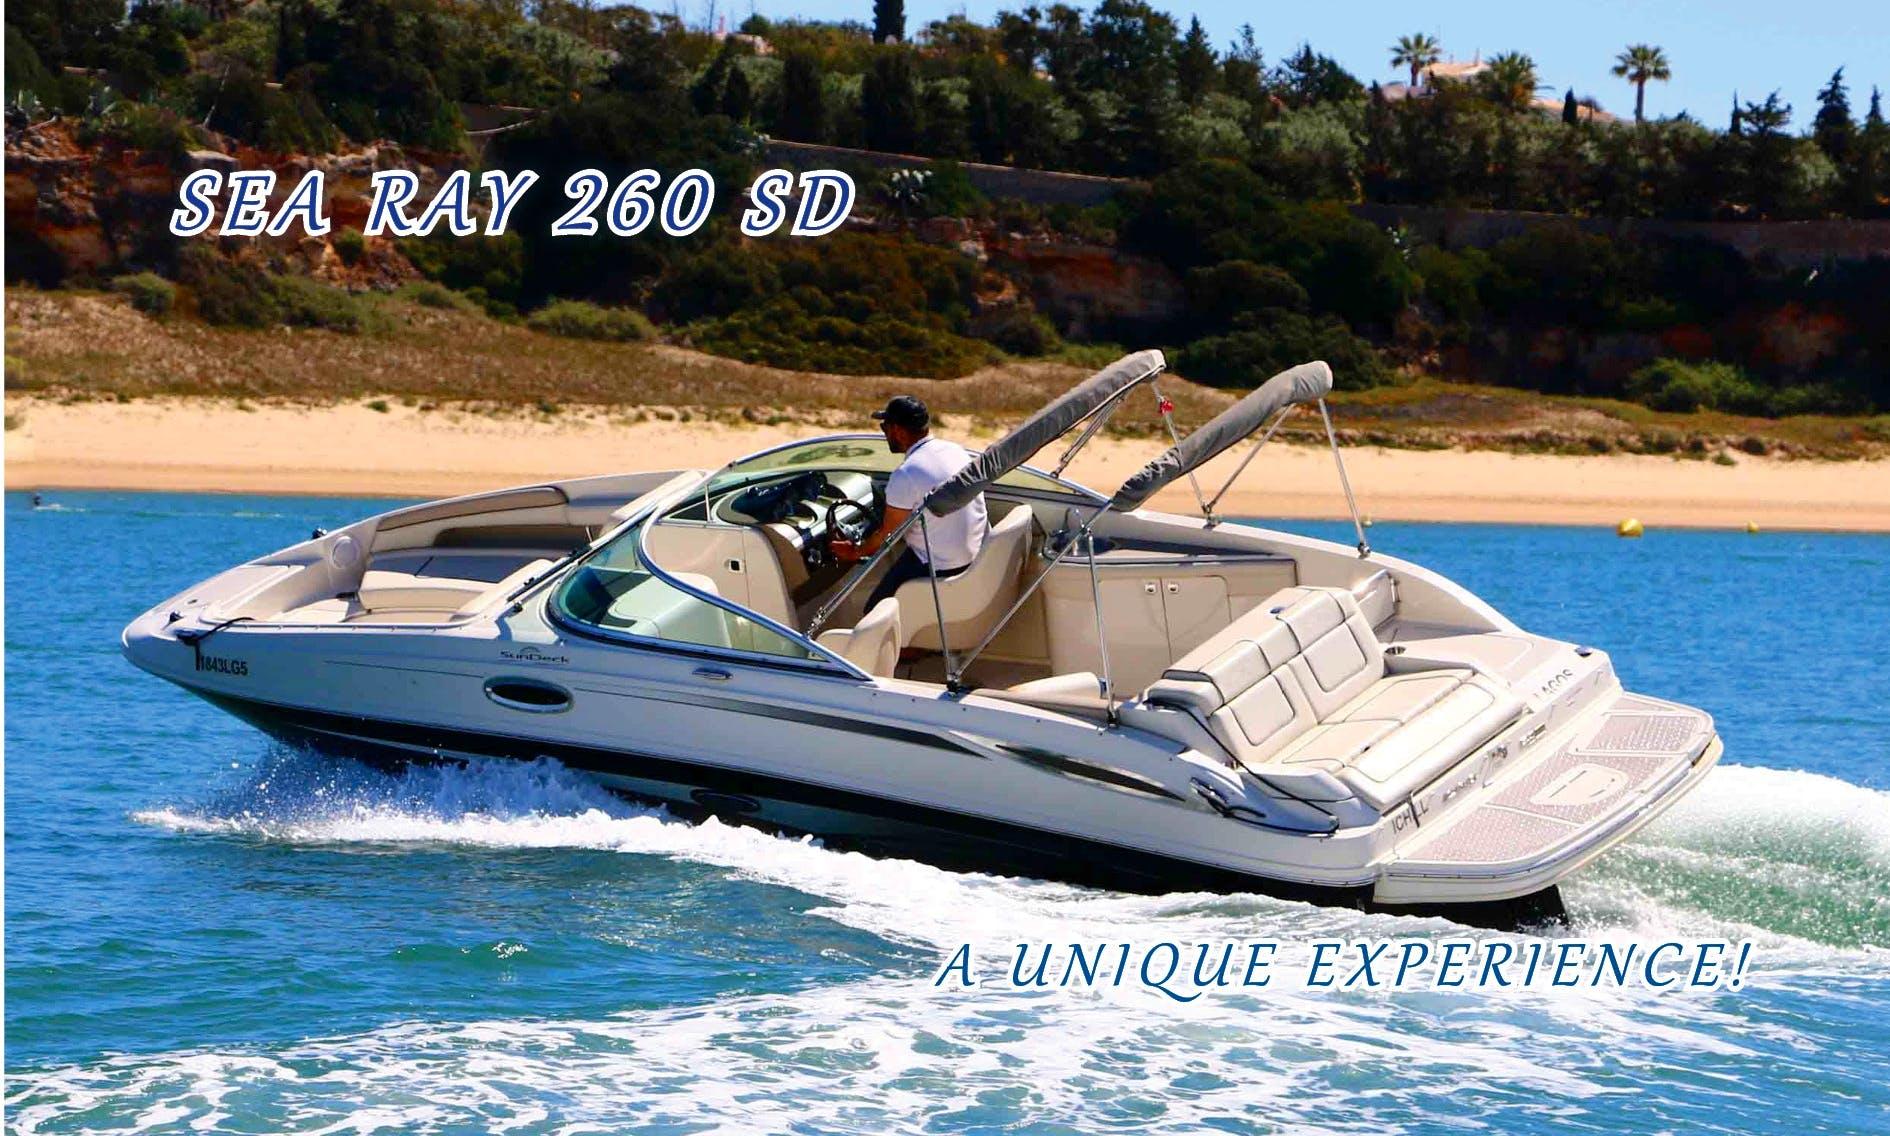 A unique experience! Sea Ray 260 SD rental in Portimão